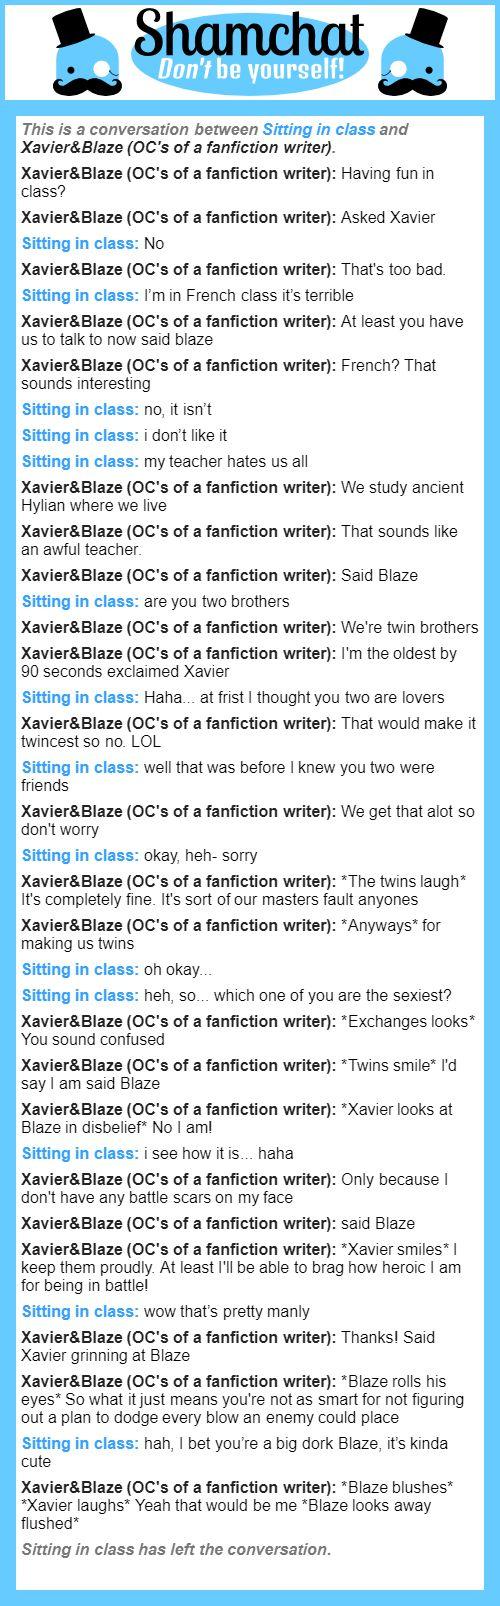 A Conversation Between XavierBlaze OCs Of Fanfiction Writer And Sitting